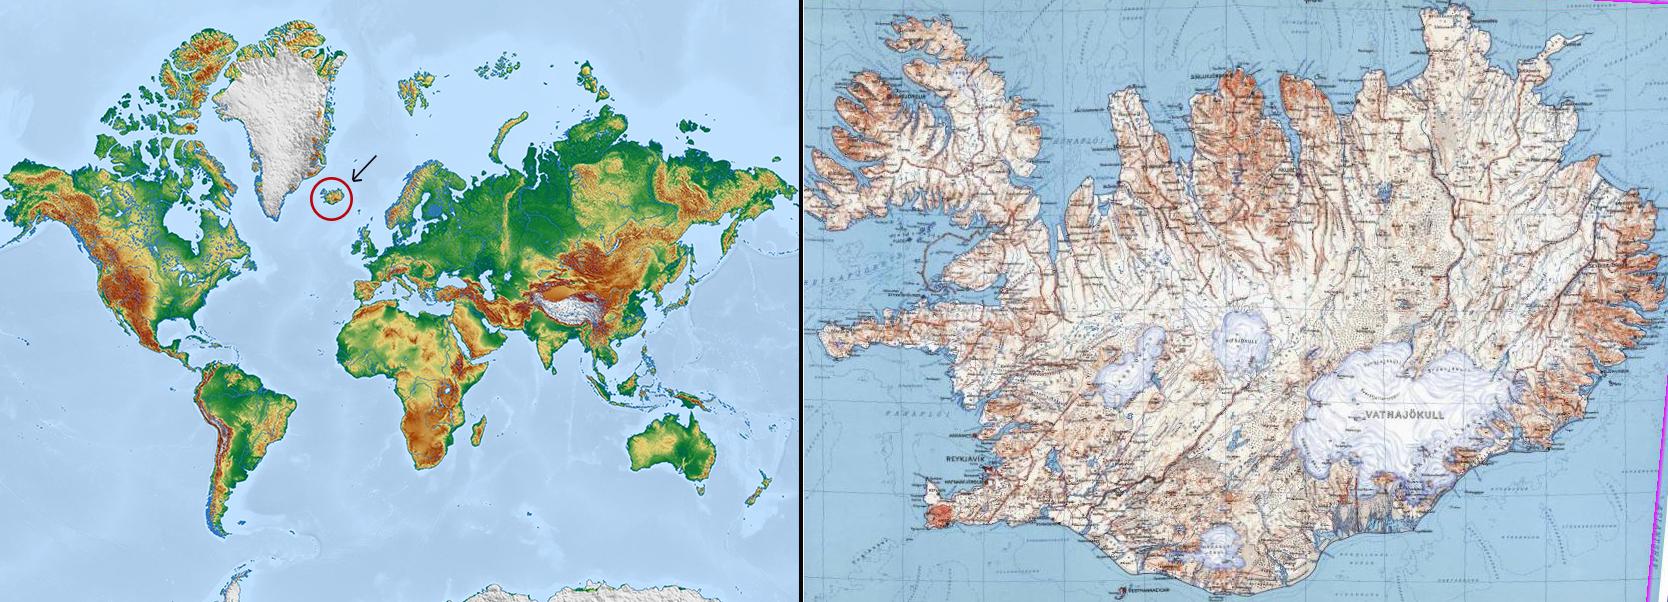 Mapa Mundi + Islandia web-R4W